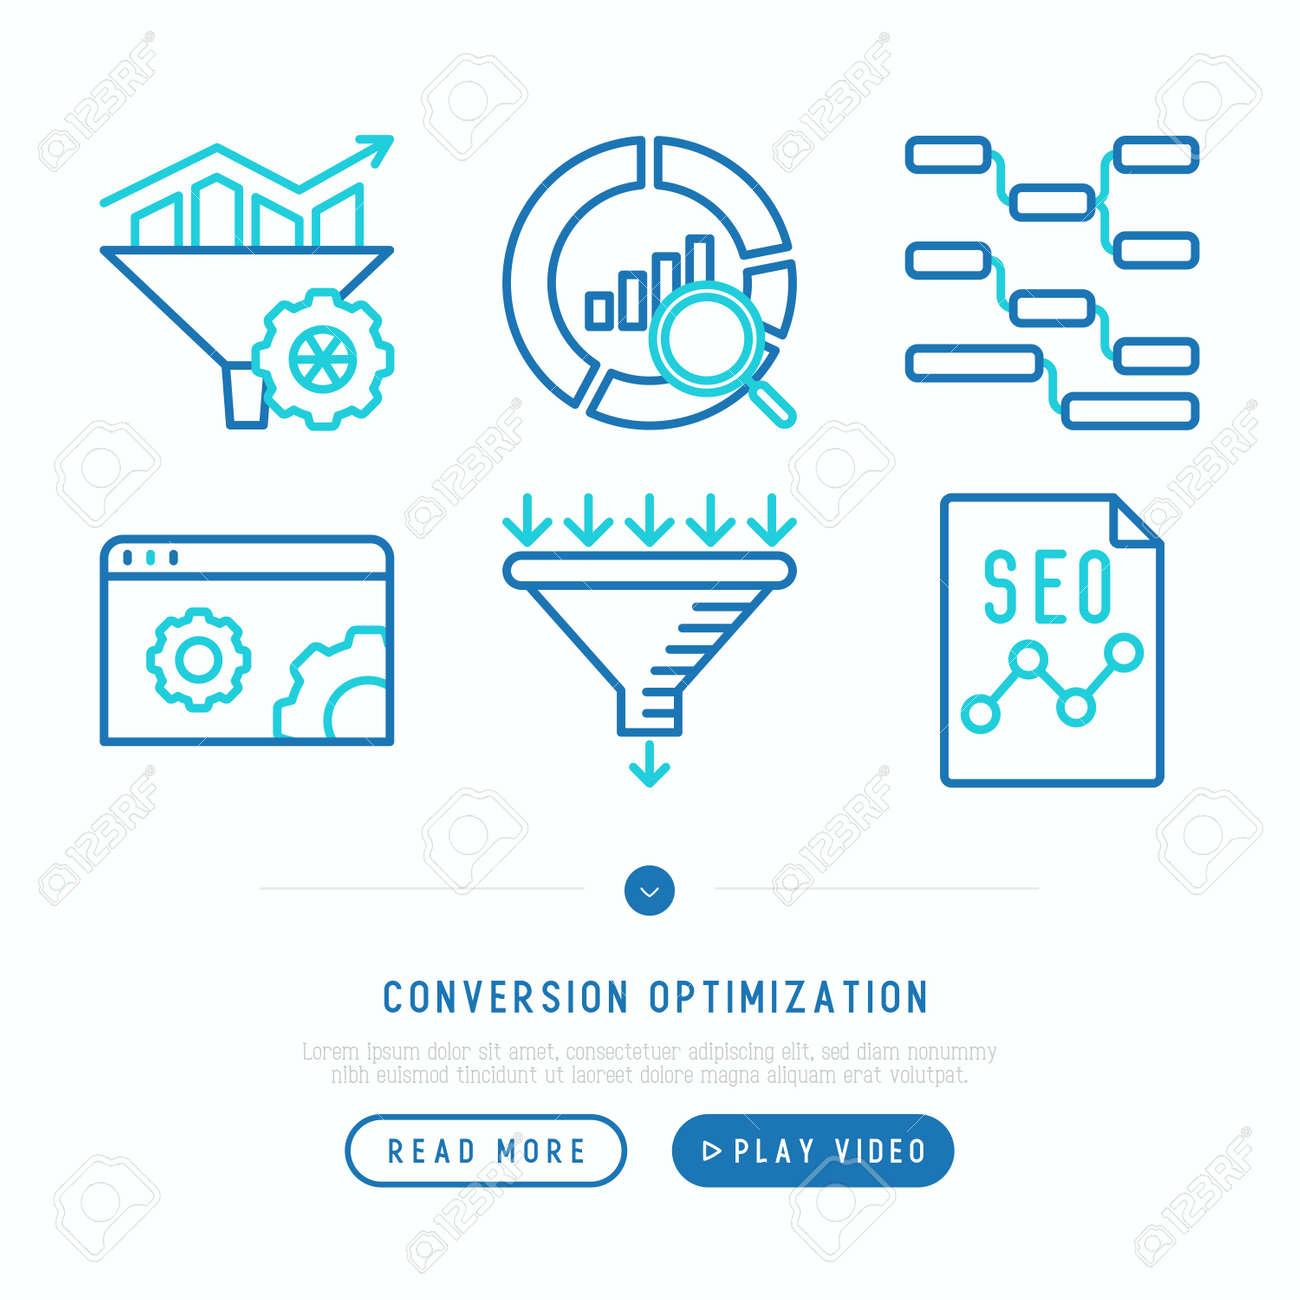 Conversion optimization thin line icons set: marketing, customer management, SEO technology, website promotion, visitors, sales funnel, web traffic. Modern vector illustration. - 112103965